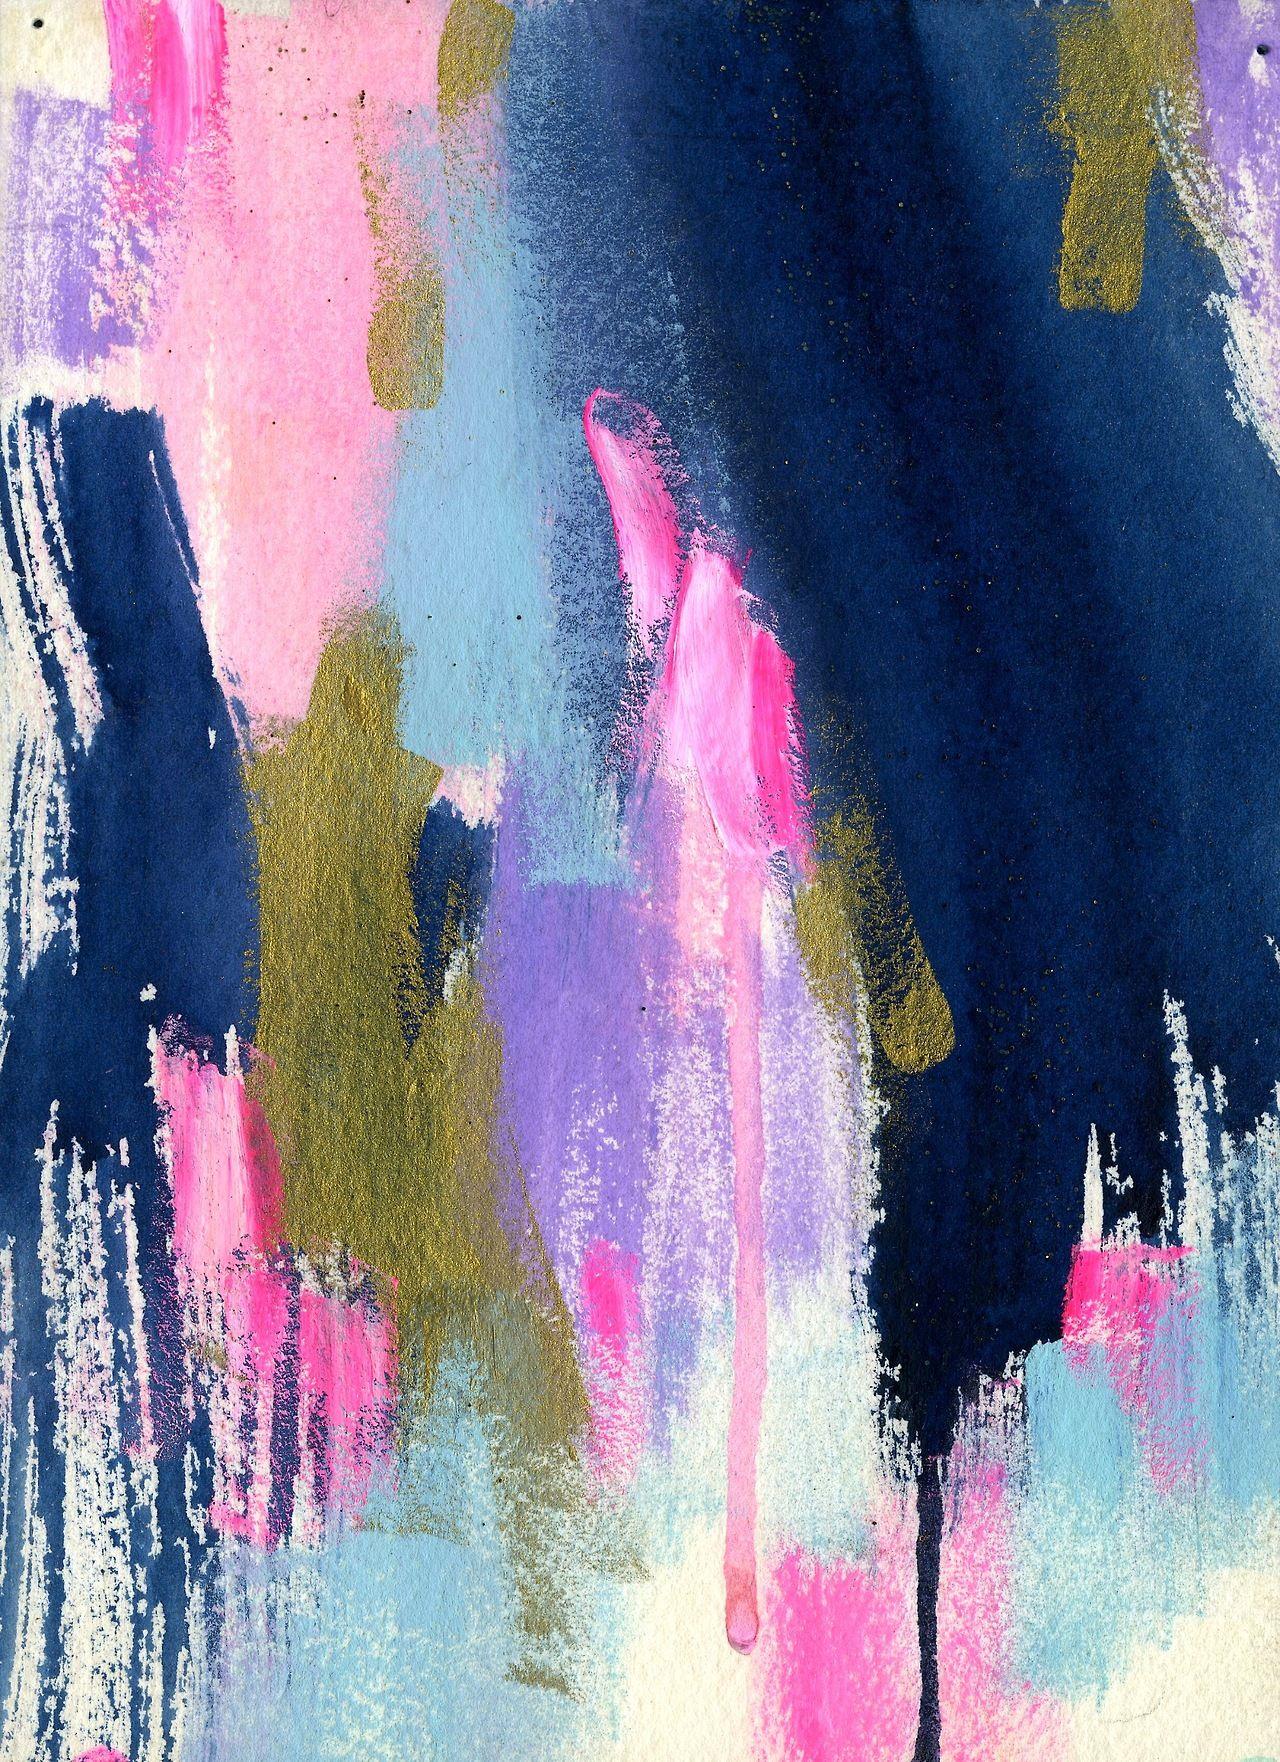 Hallway wallpaper or paint  Kayla Newell  Hallway art  Pinterest  Gouache Watercolor and